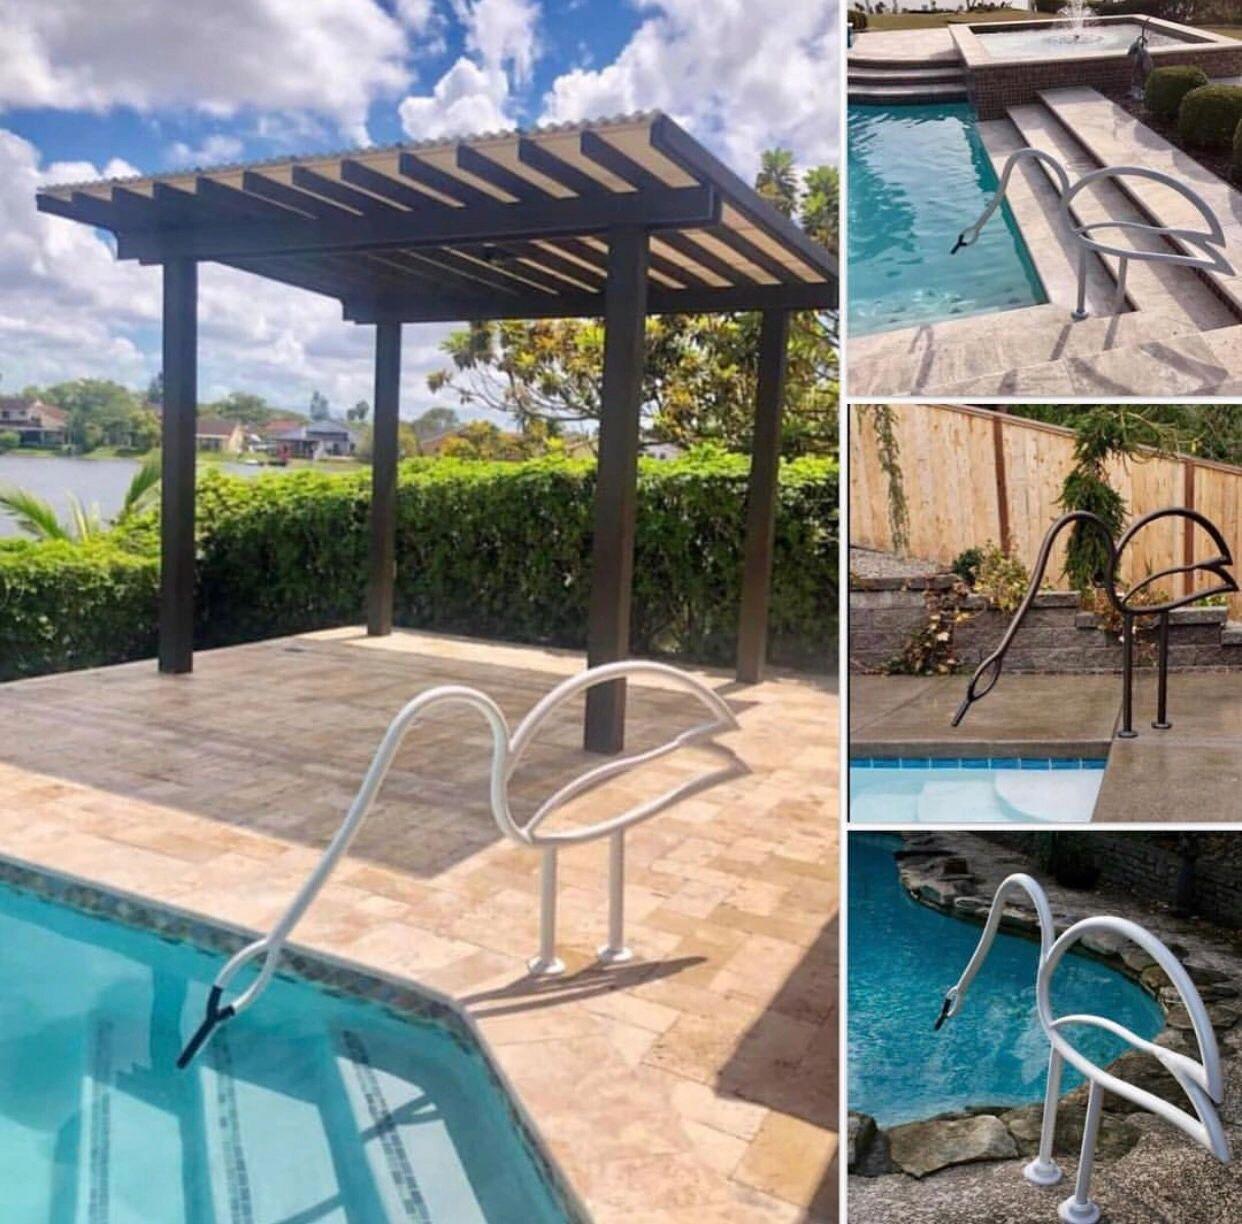 Swan Pool Rails - Swimming Pool Handrails, Swimming Pools, Pool Rails